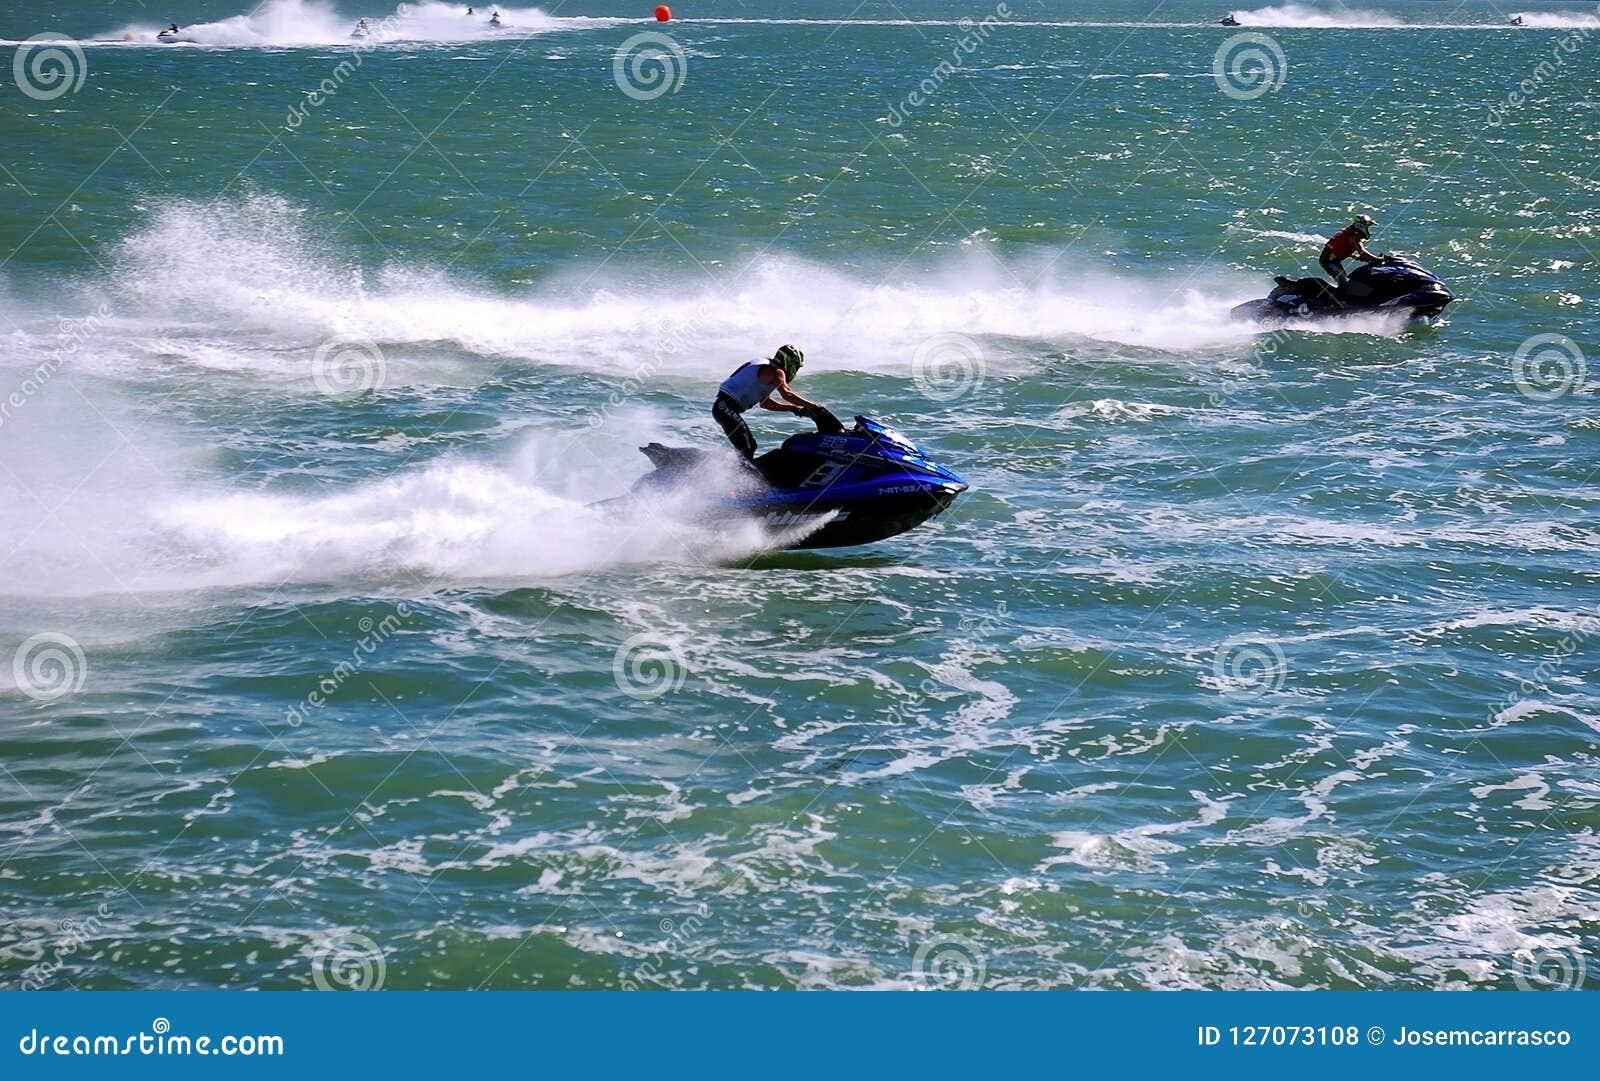 Bikini Nude Jet Ski Races Gif